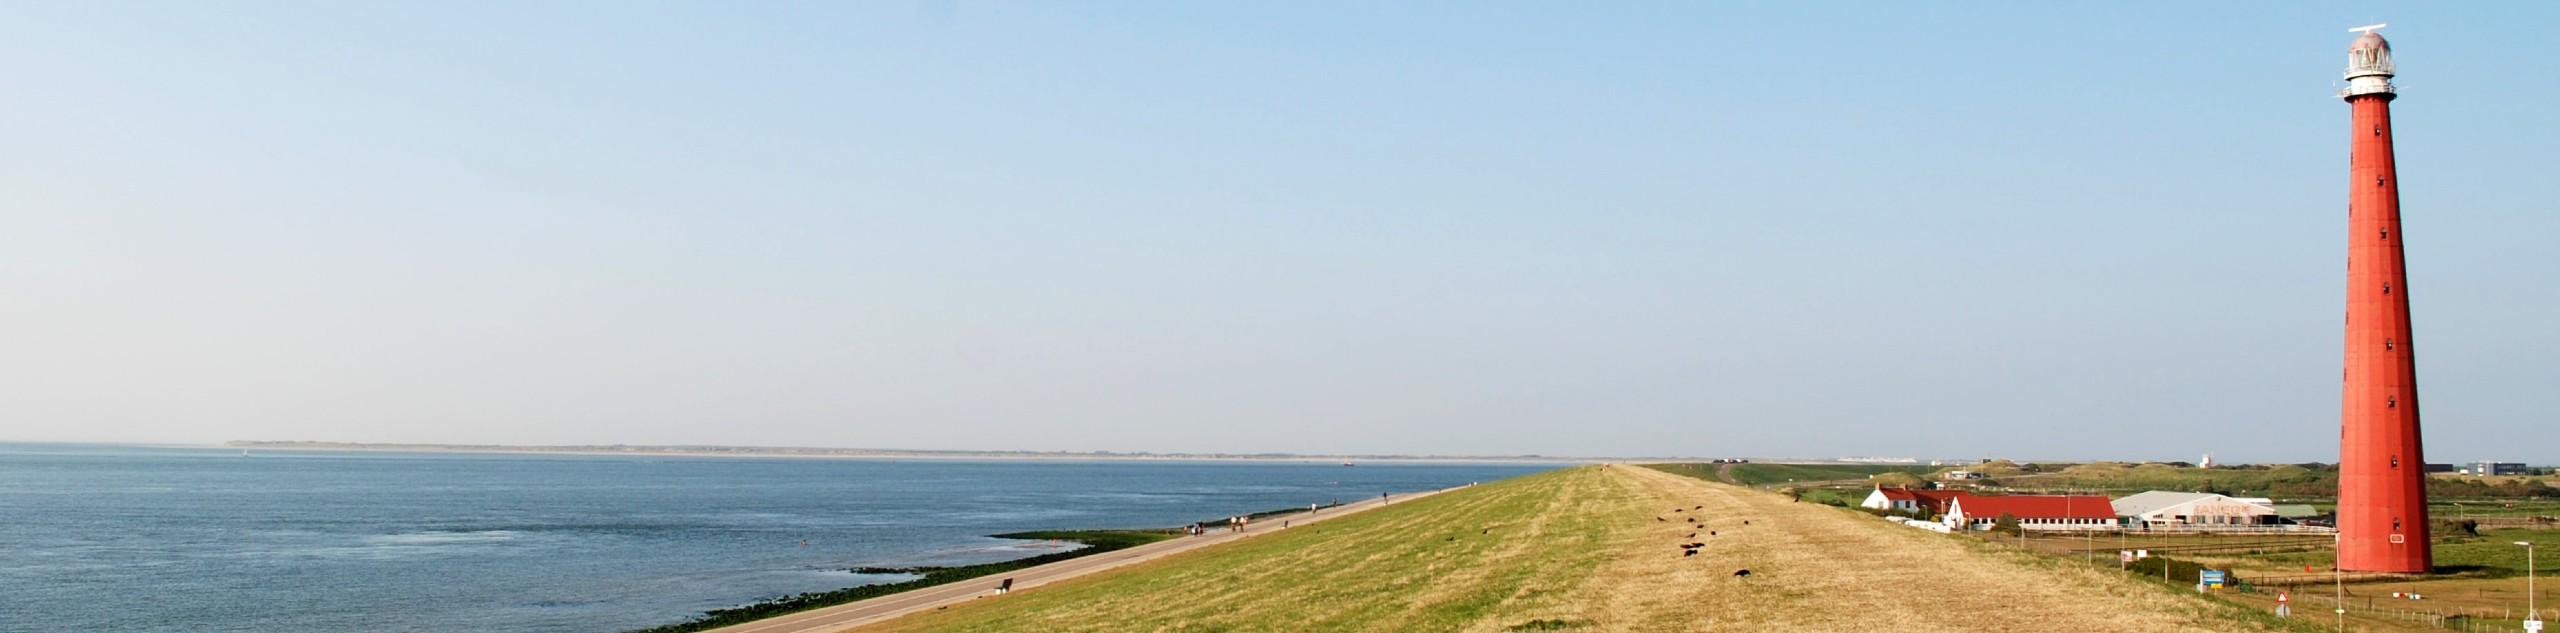 Shoreline at North Holland, Netherlands